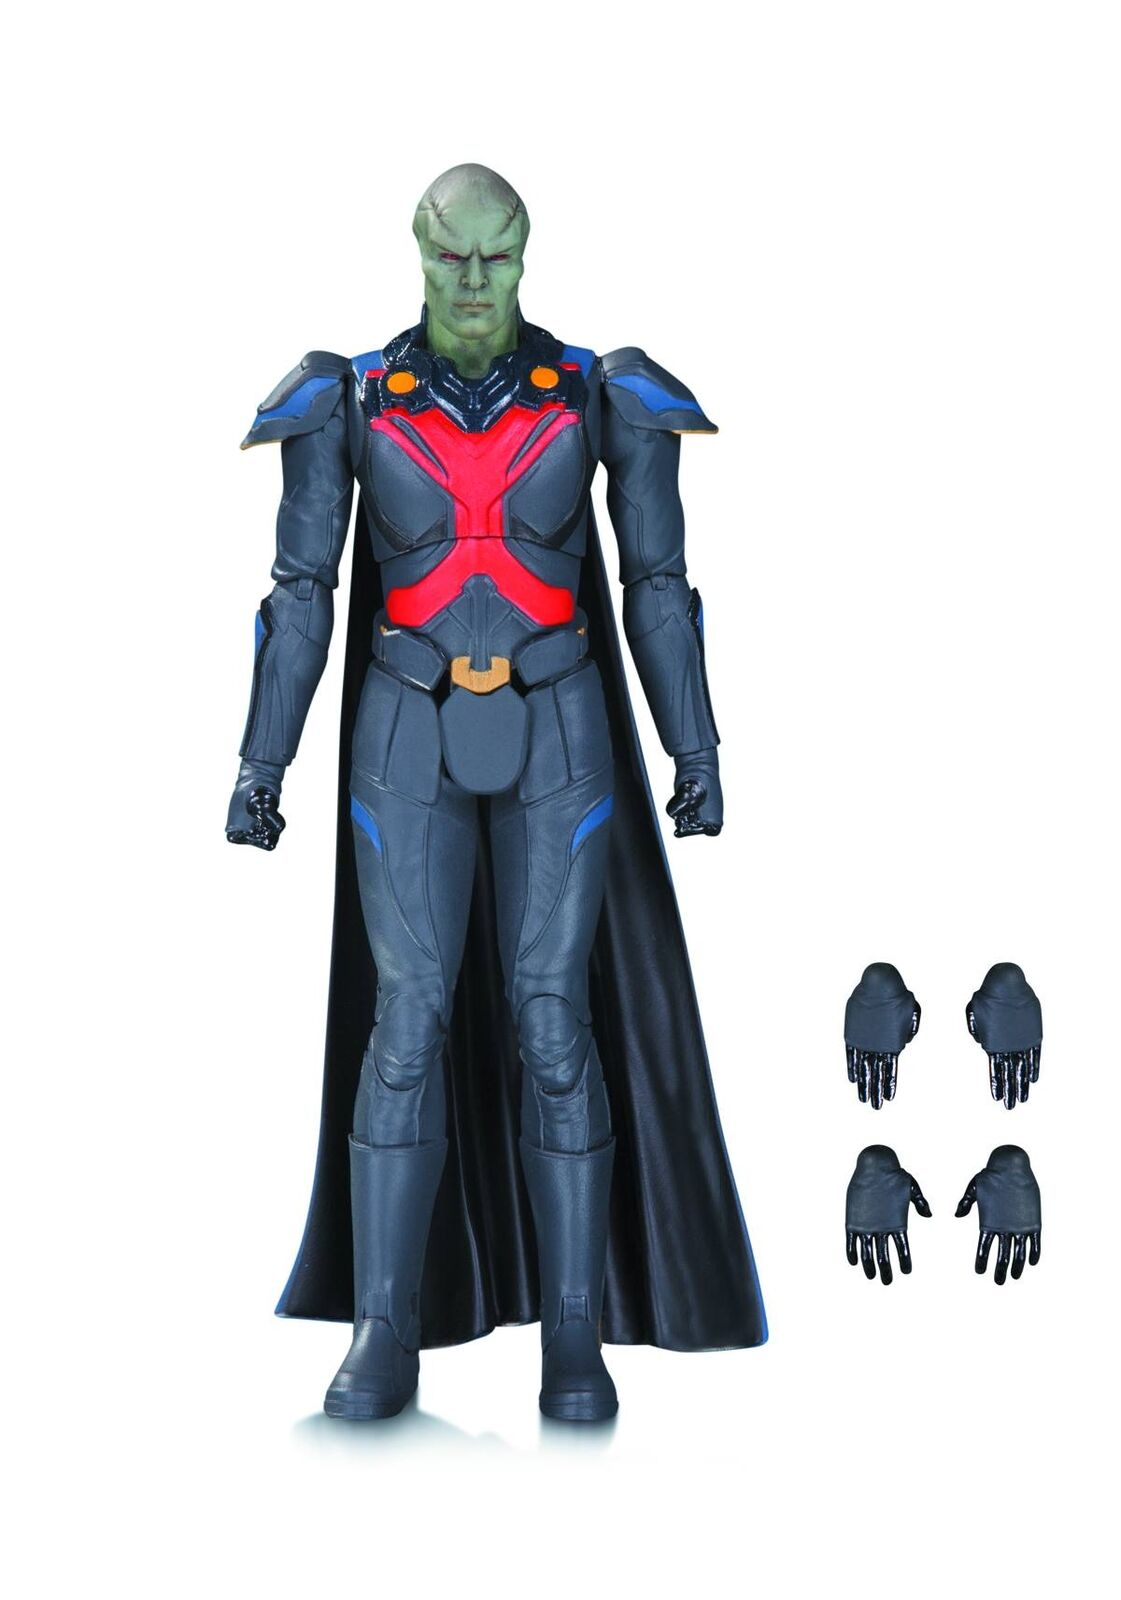 Dc comics supergirl tv - serie aktion bild  Blautmond